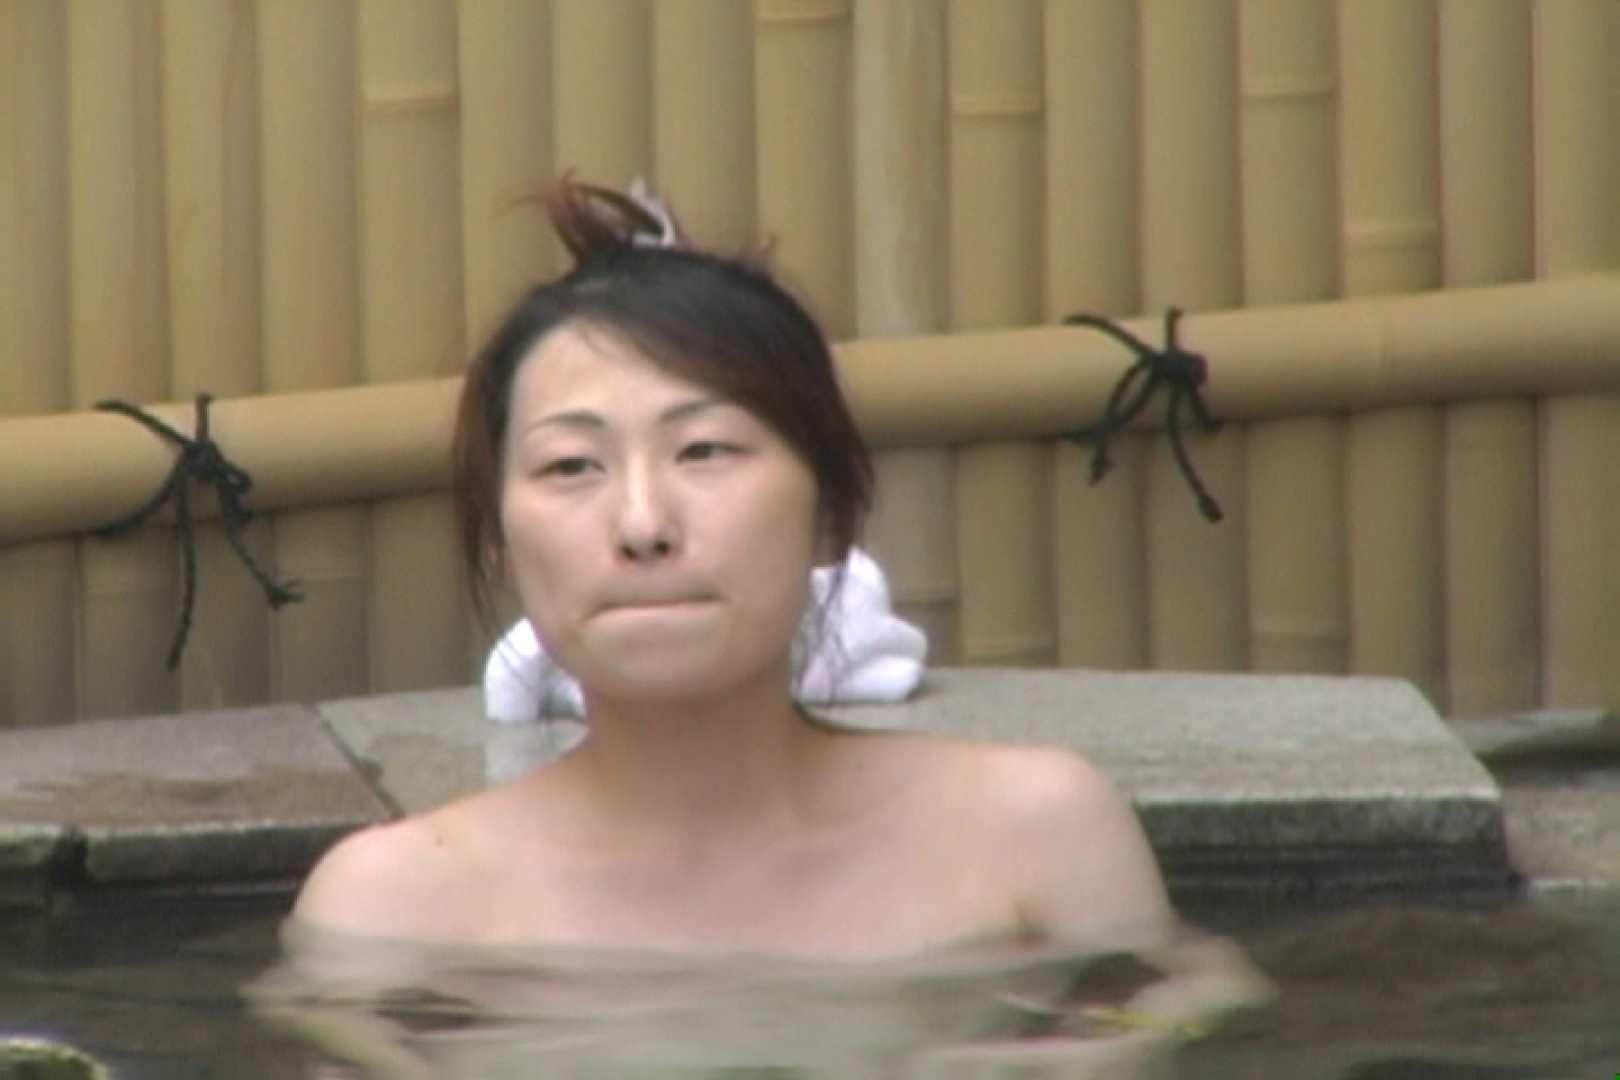 Aquaな露天風呂Vol.615 0   0  36連発 13